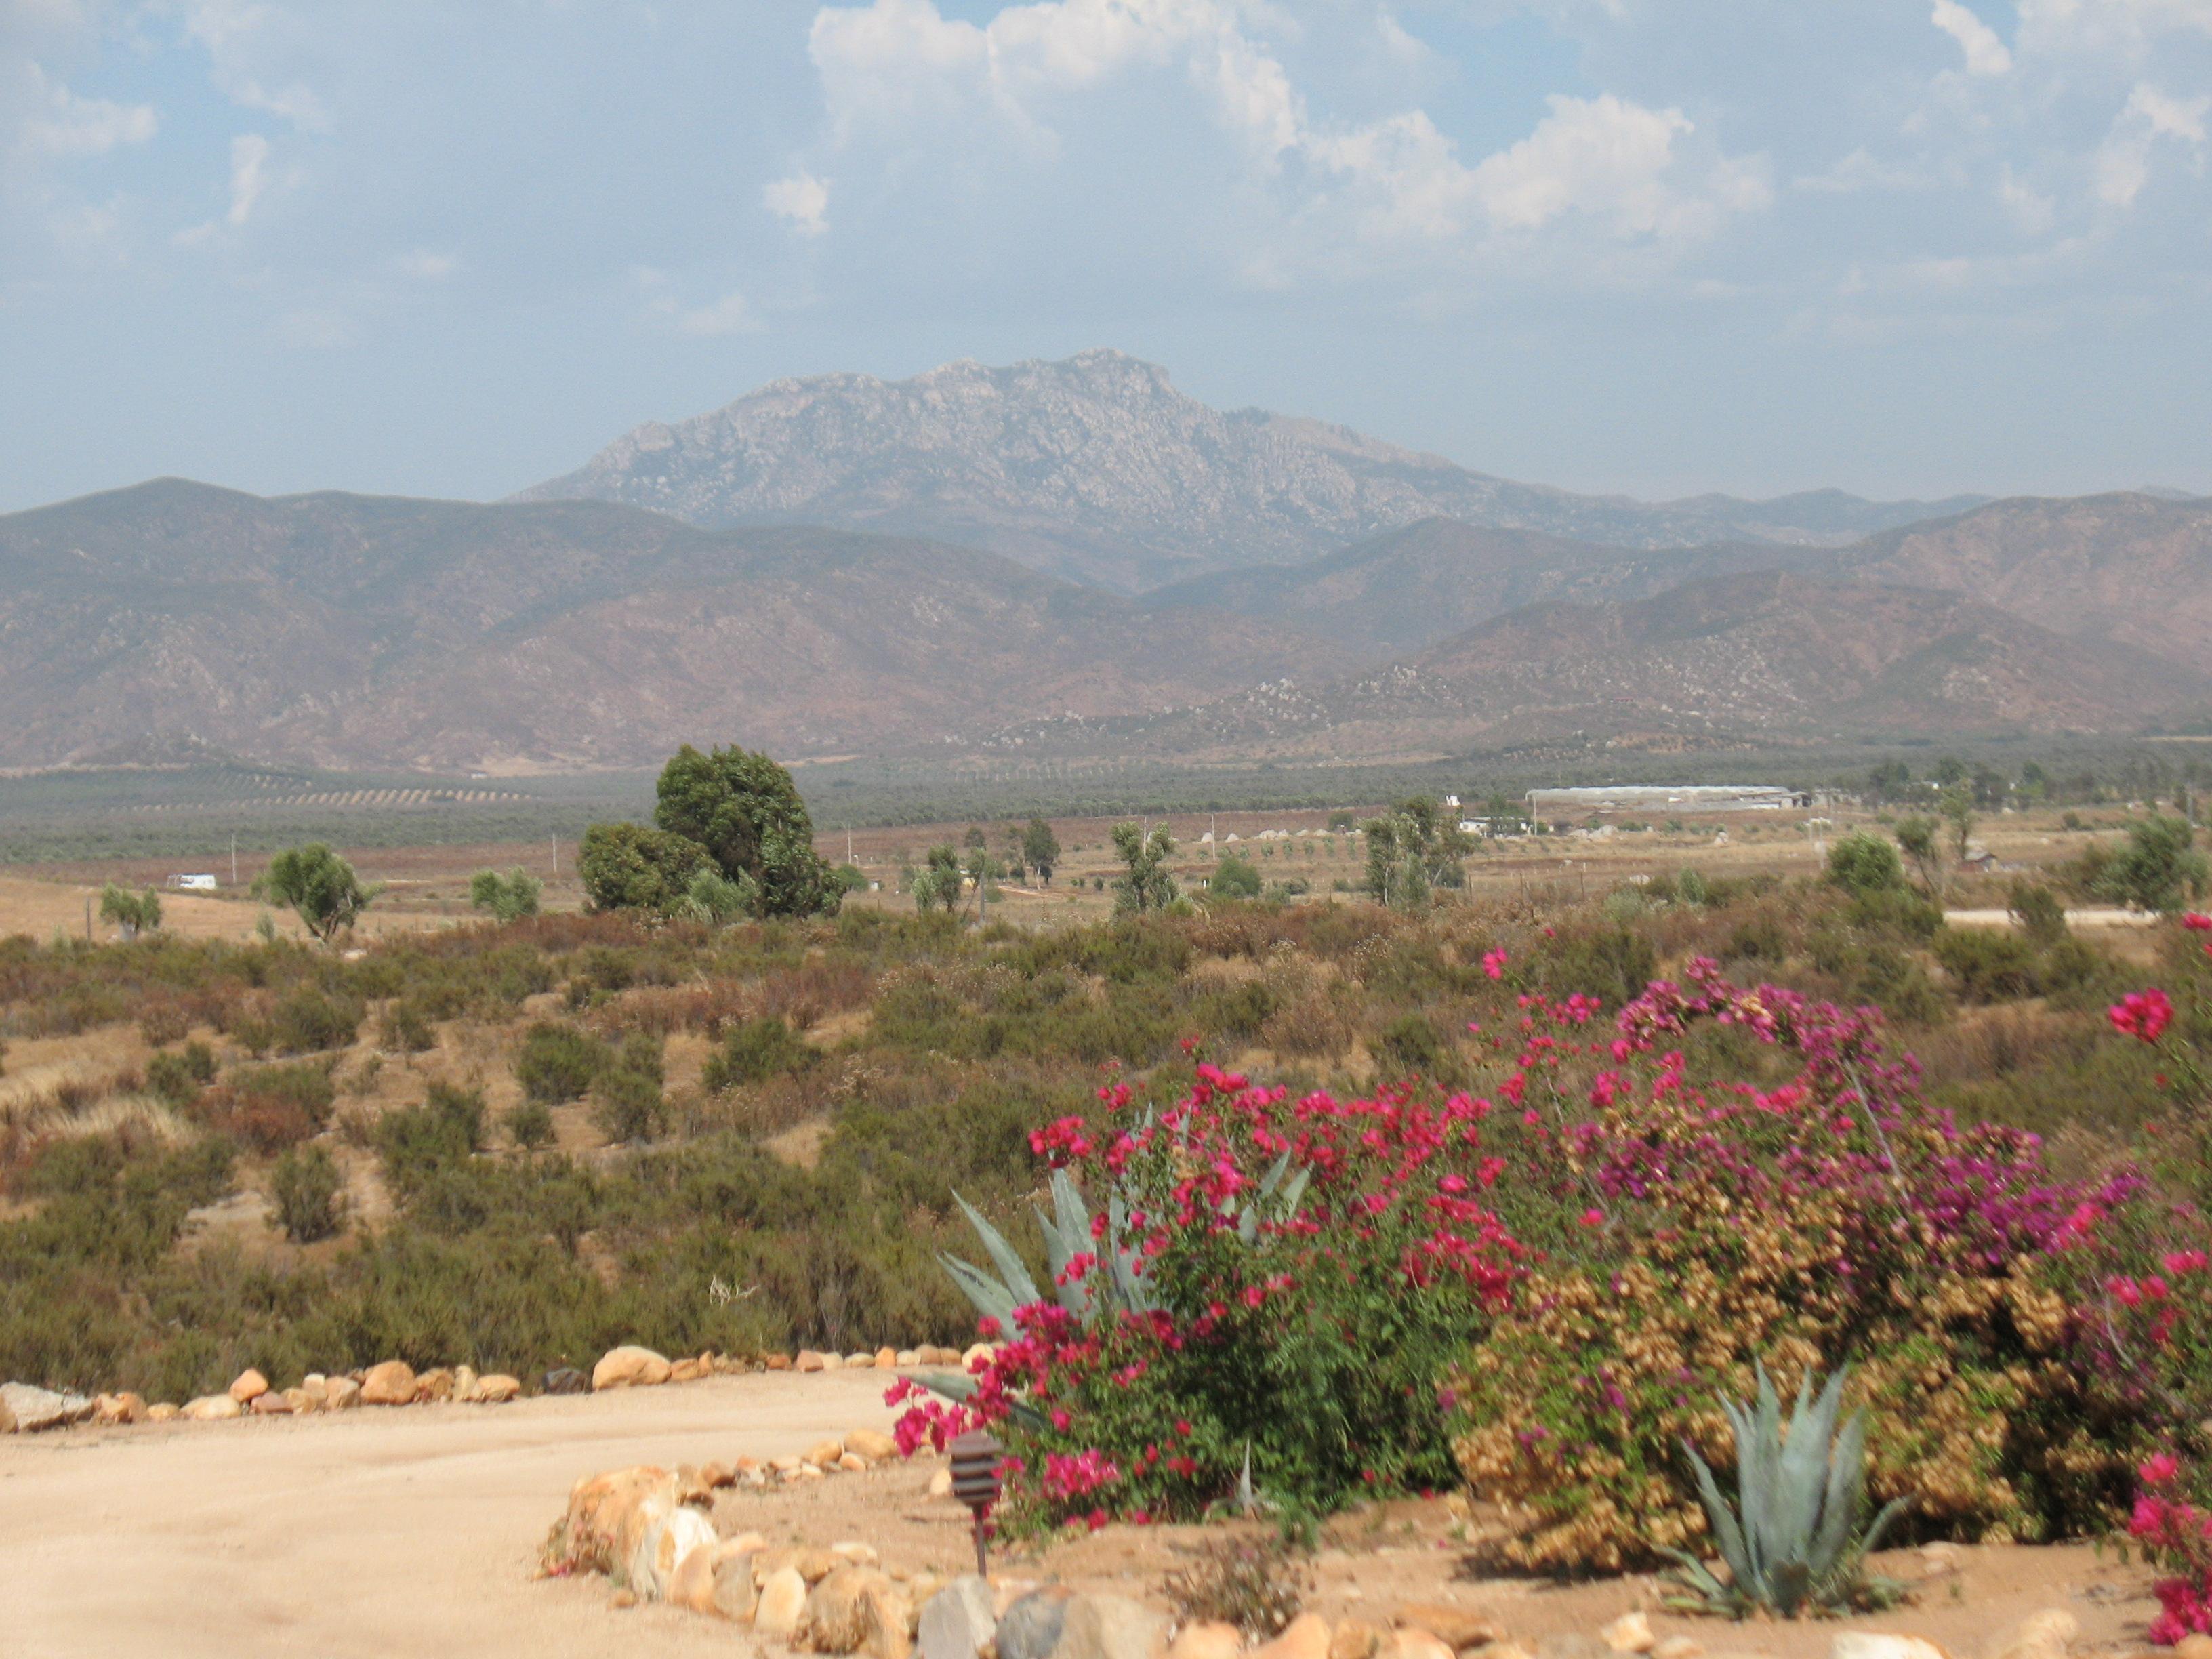 Guadelupe Valley, Baja California